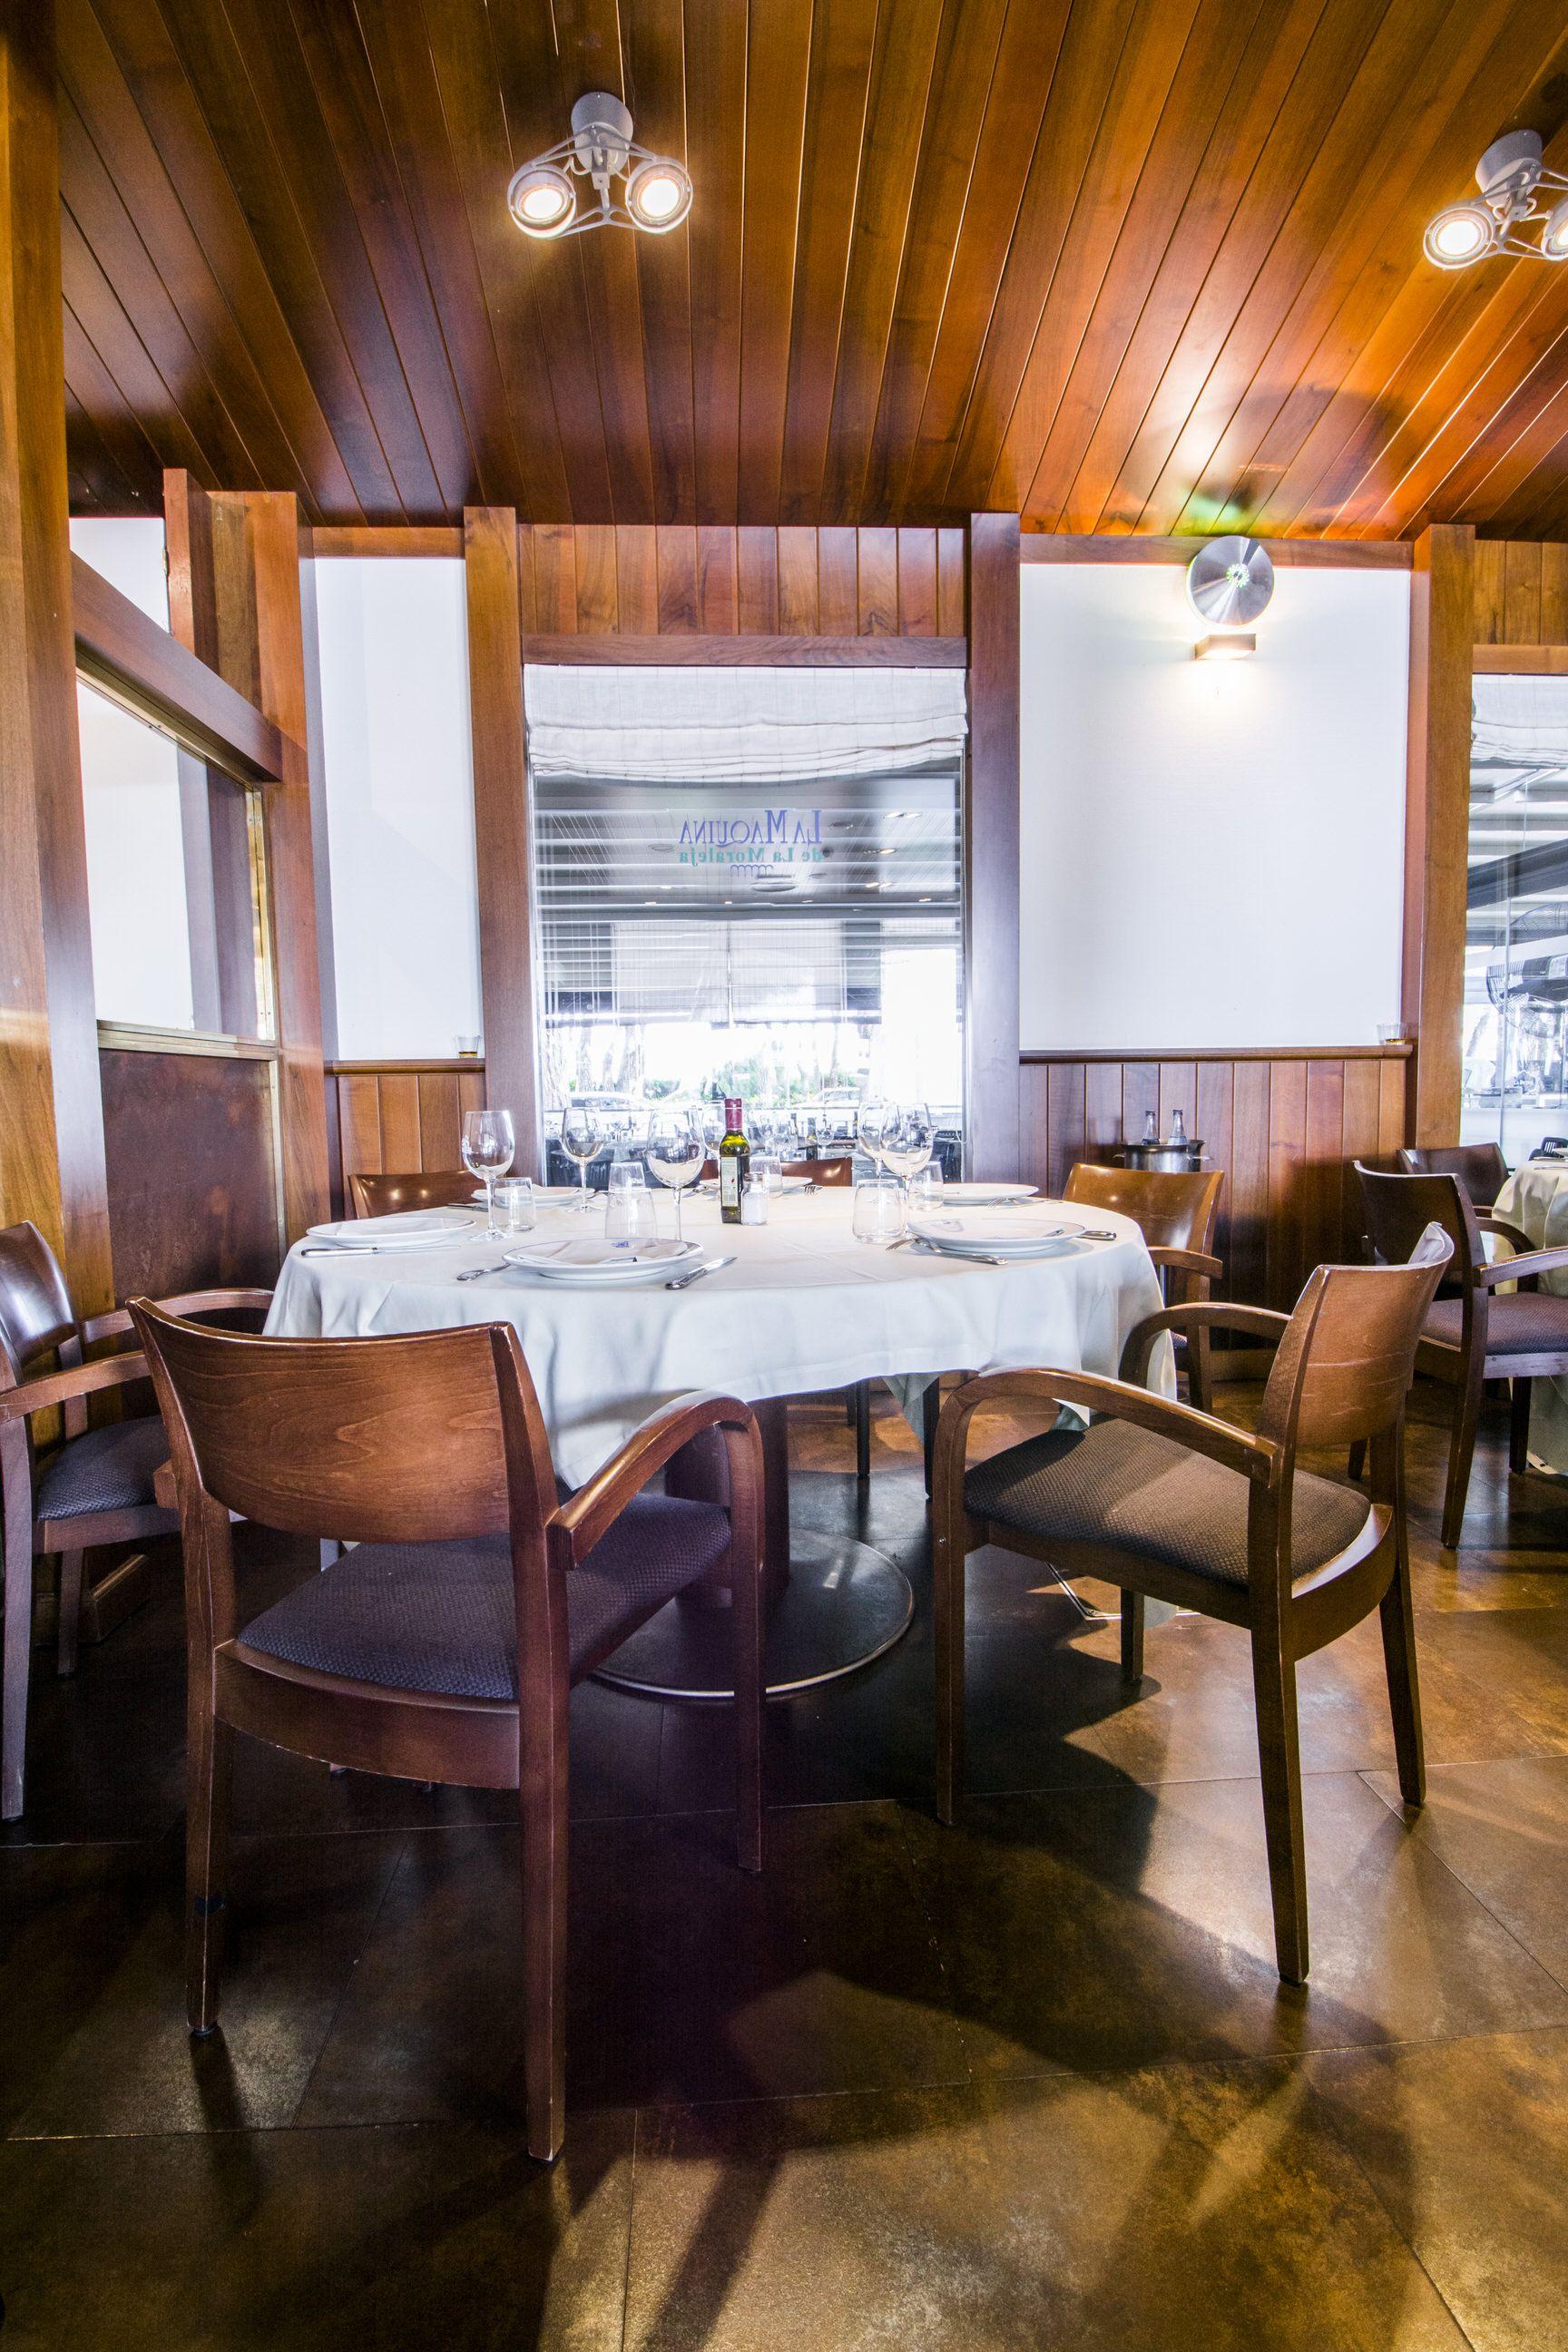 Mesa Del Salón Interior De La Máquina De La Moraleja Maquinista Interiores Restaurantes